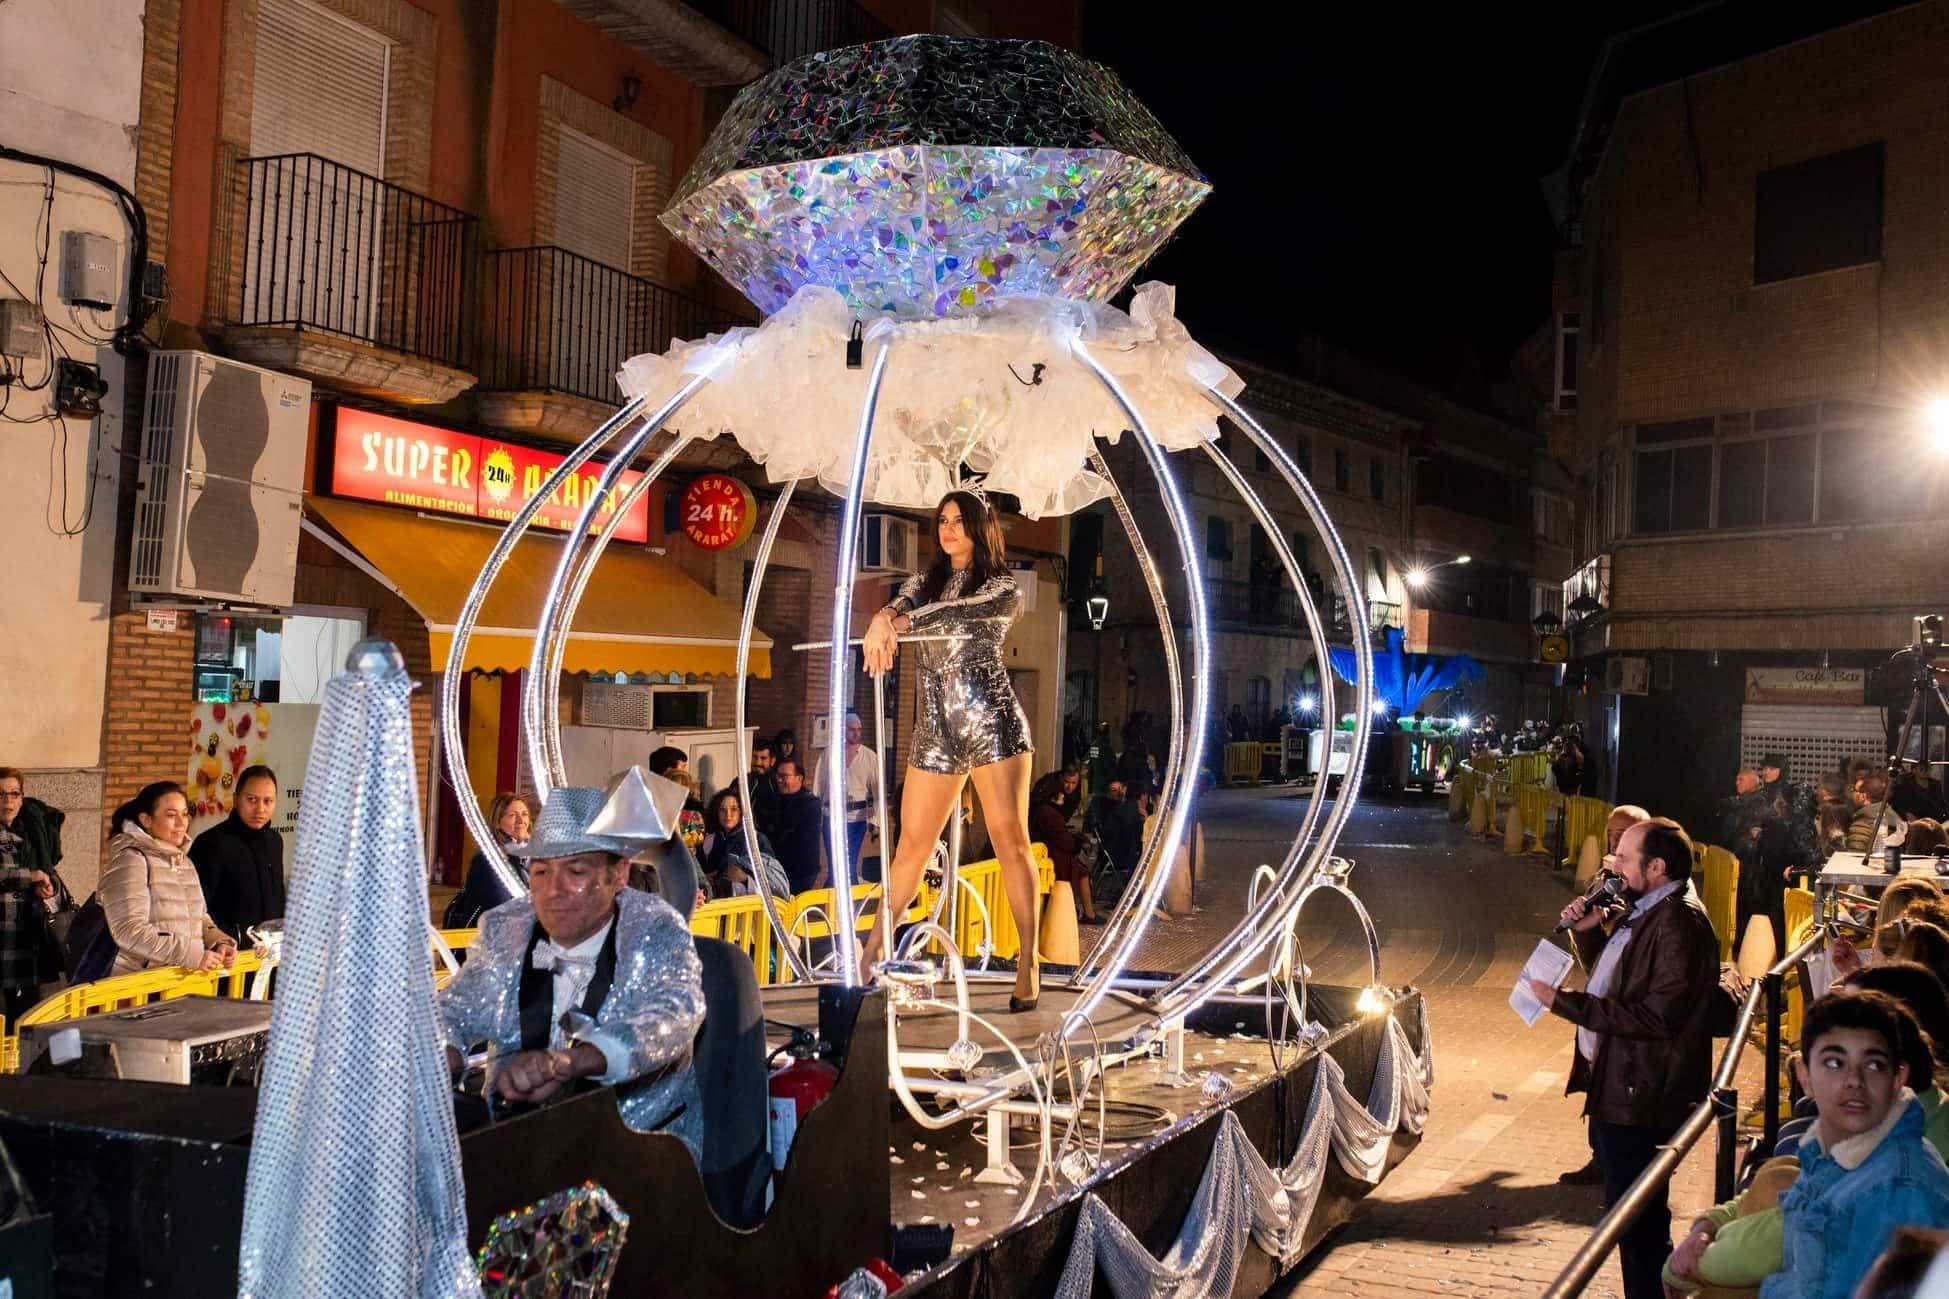 Carnaval de herencia 2020 ofertorio 11 - Selección de fotografías del Ofertorio del Carnaval de Herencia